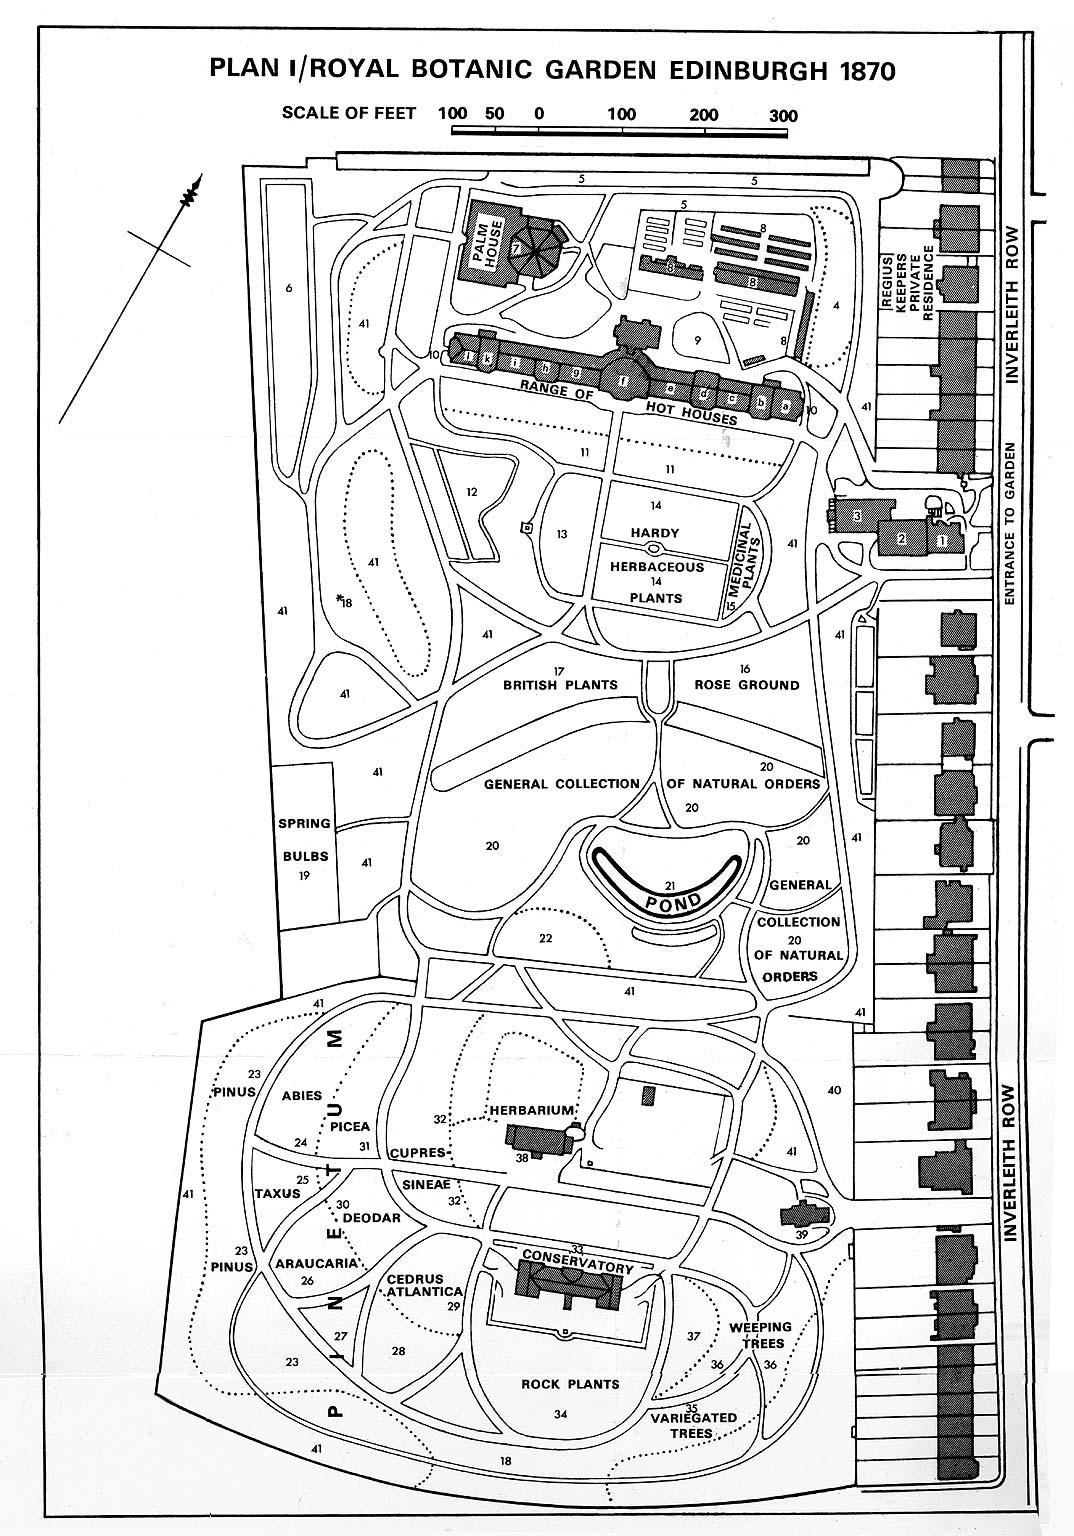 Botanic Garden Inverleith 1870